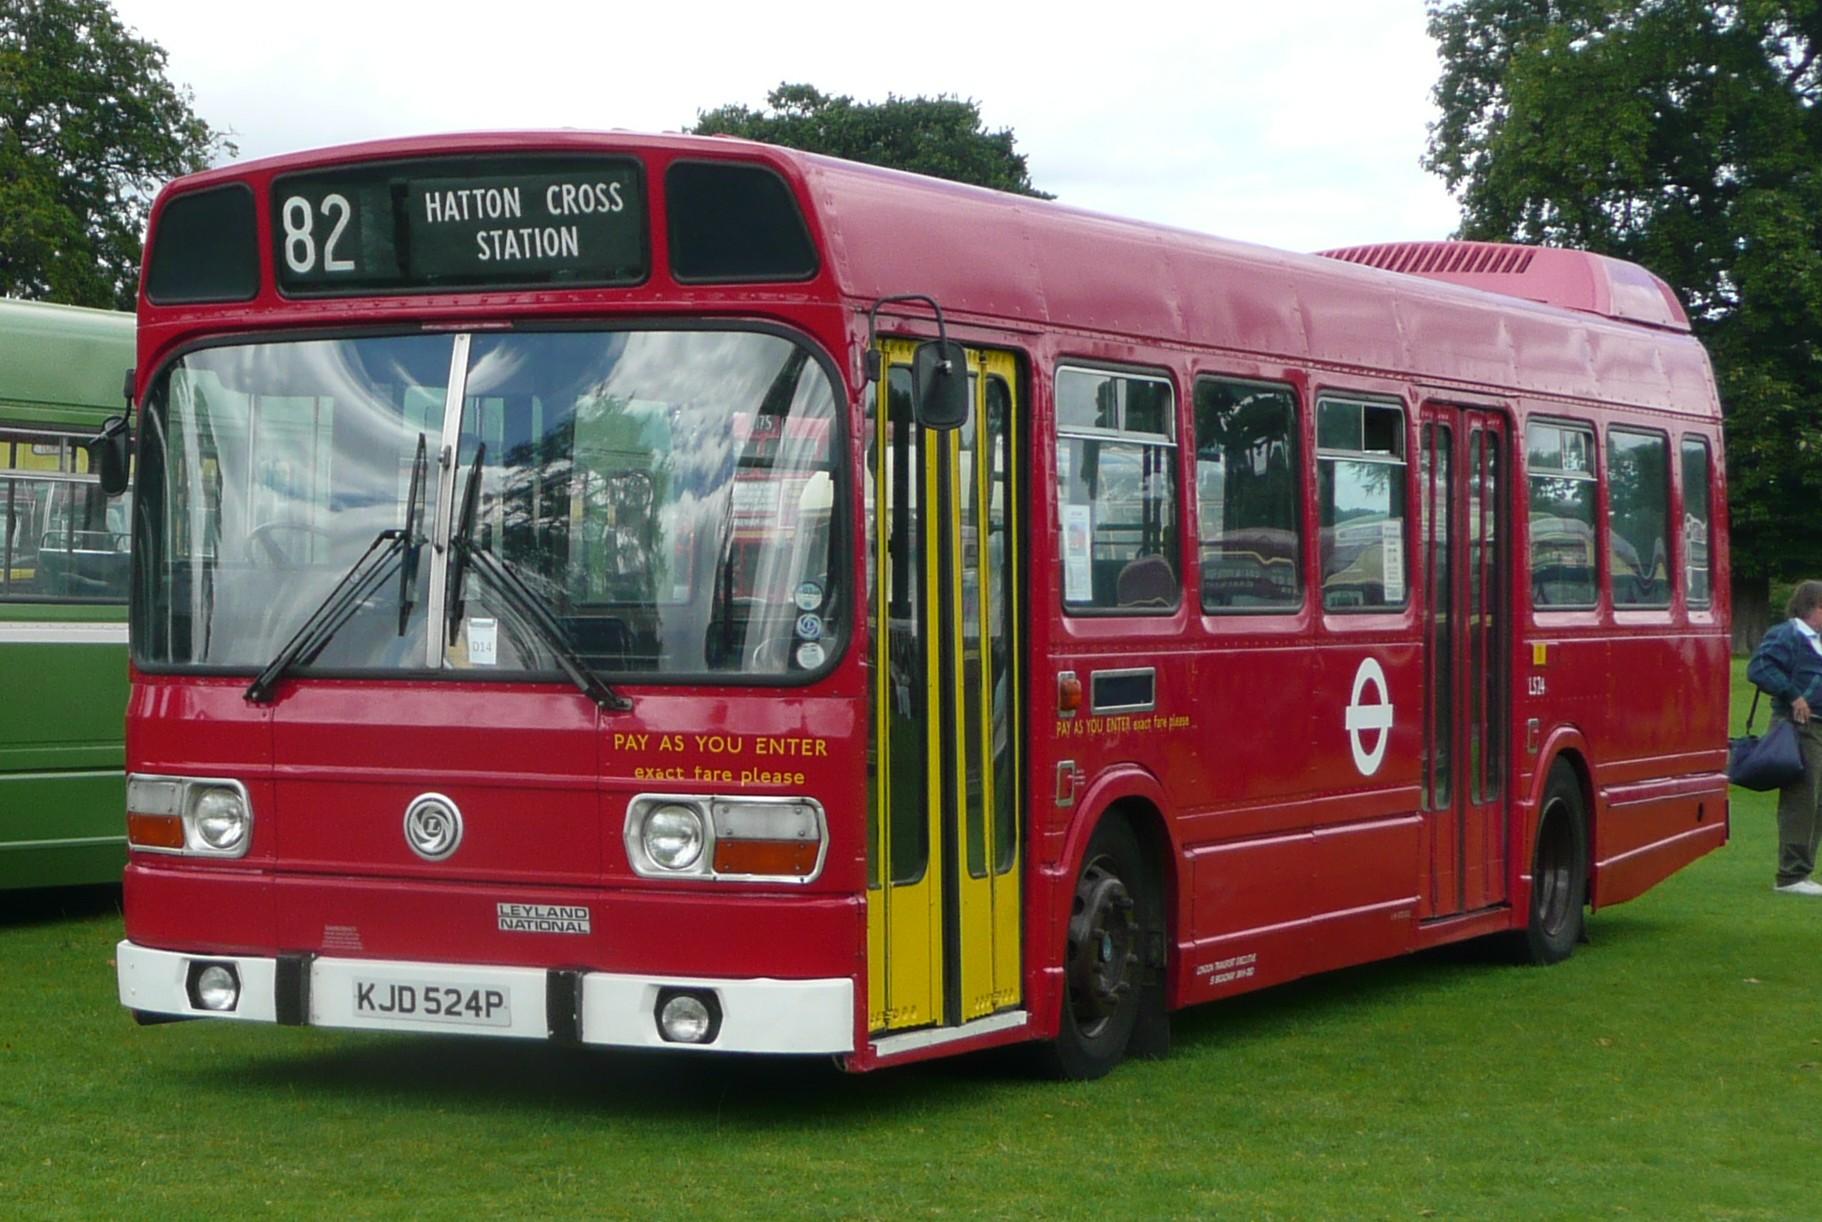 File:London Transport LS24.JPG - Wikipedia, the free encyclopedia